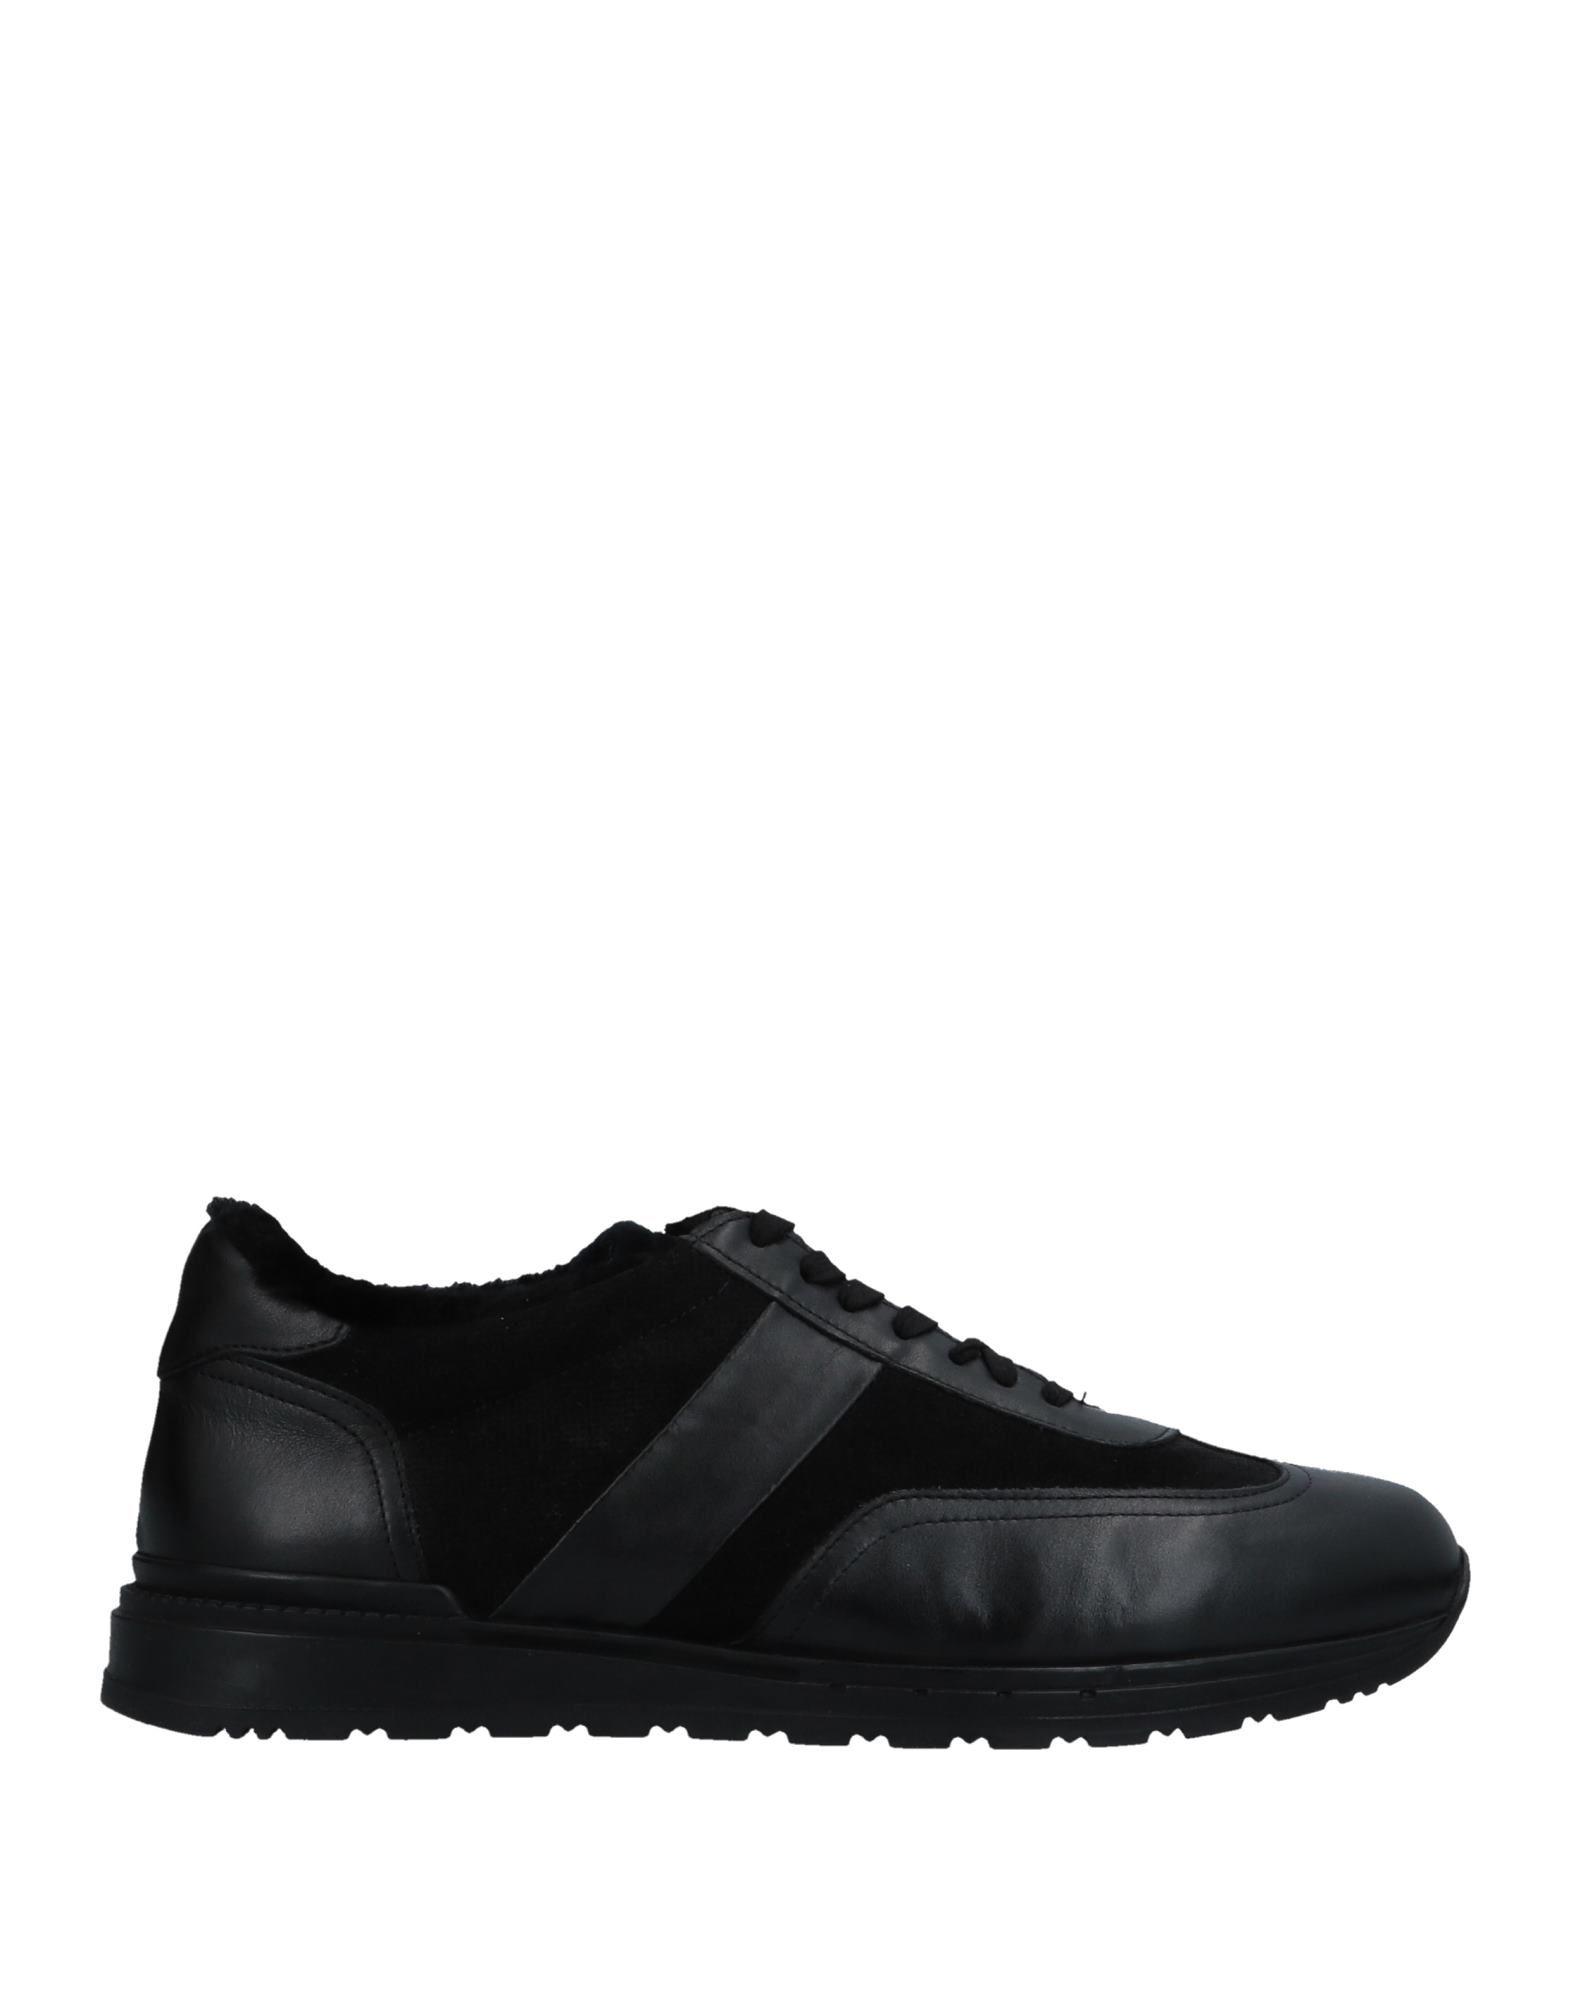 Sneakers Pellettieri Di  Parma Uomo - 11505424GR